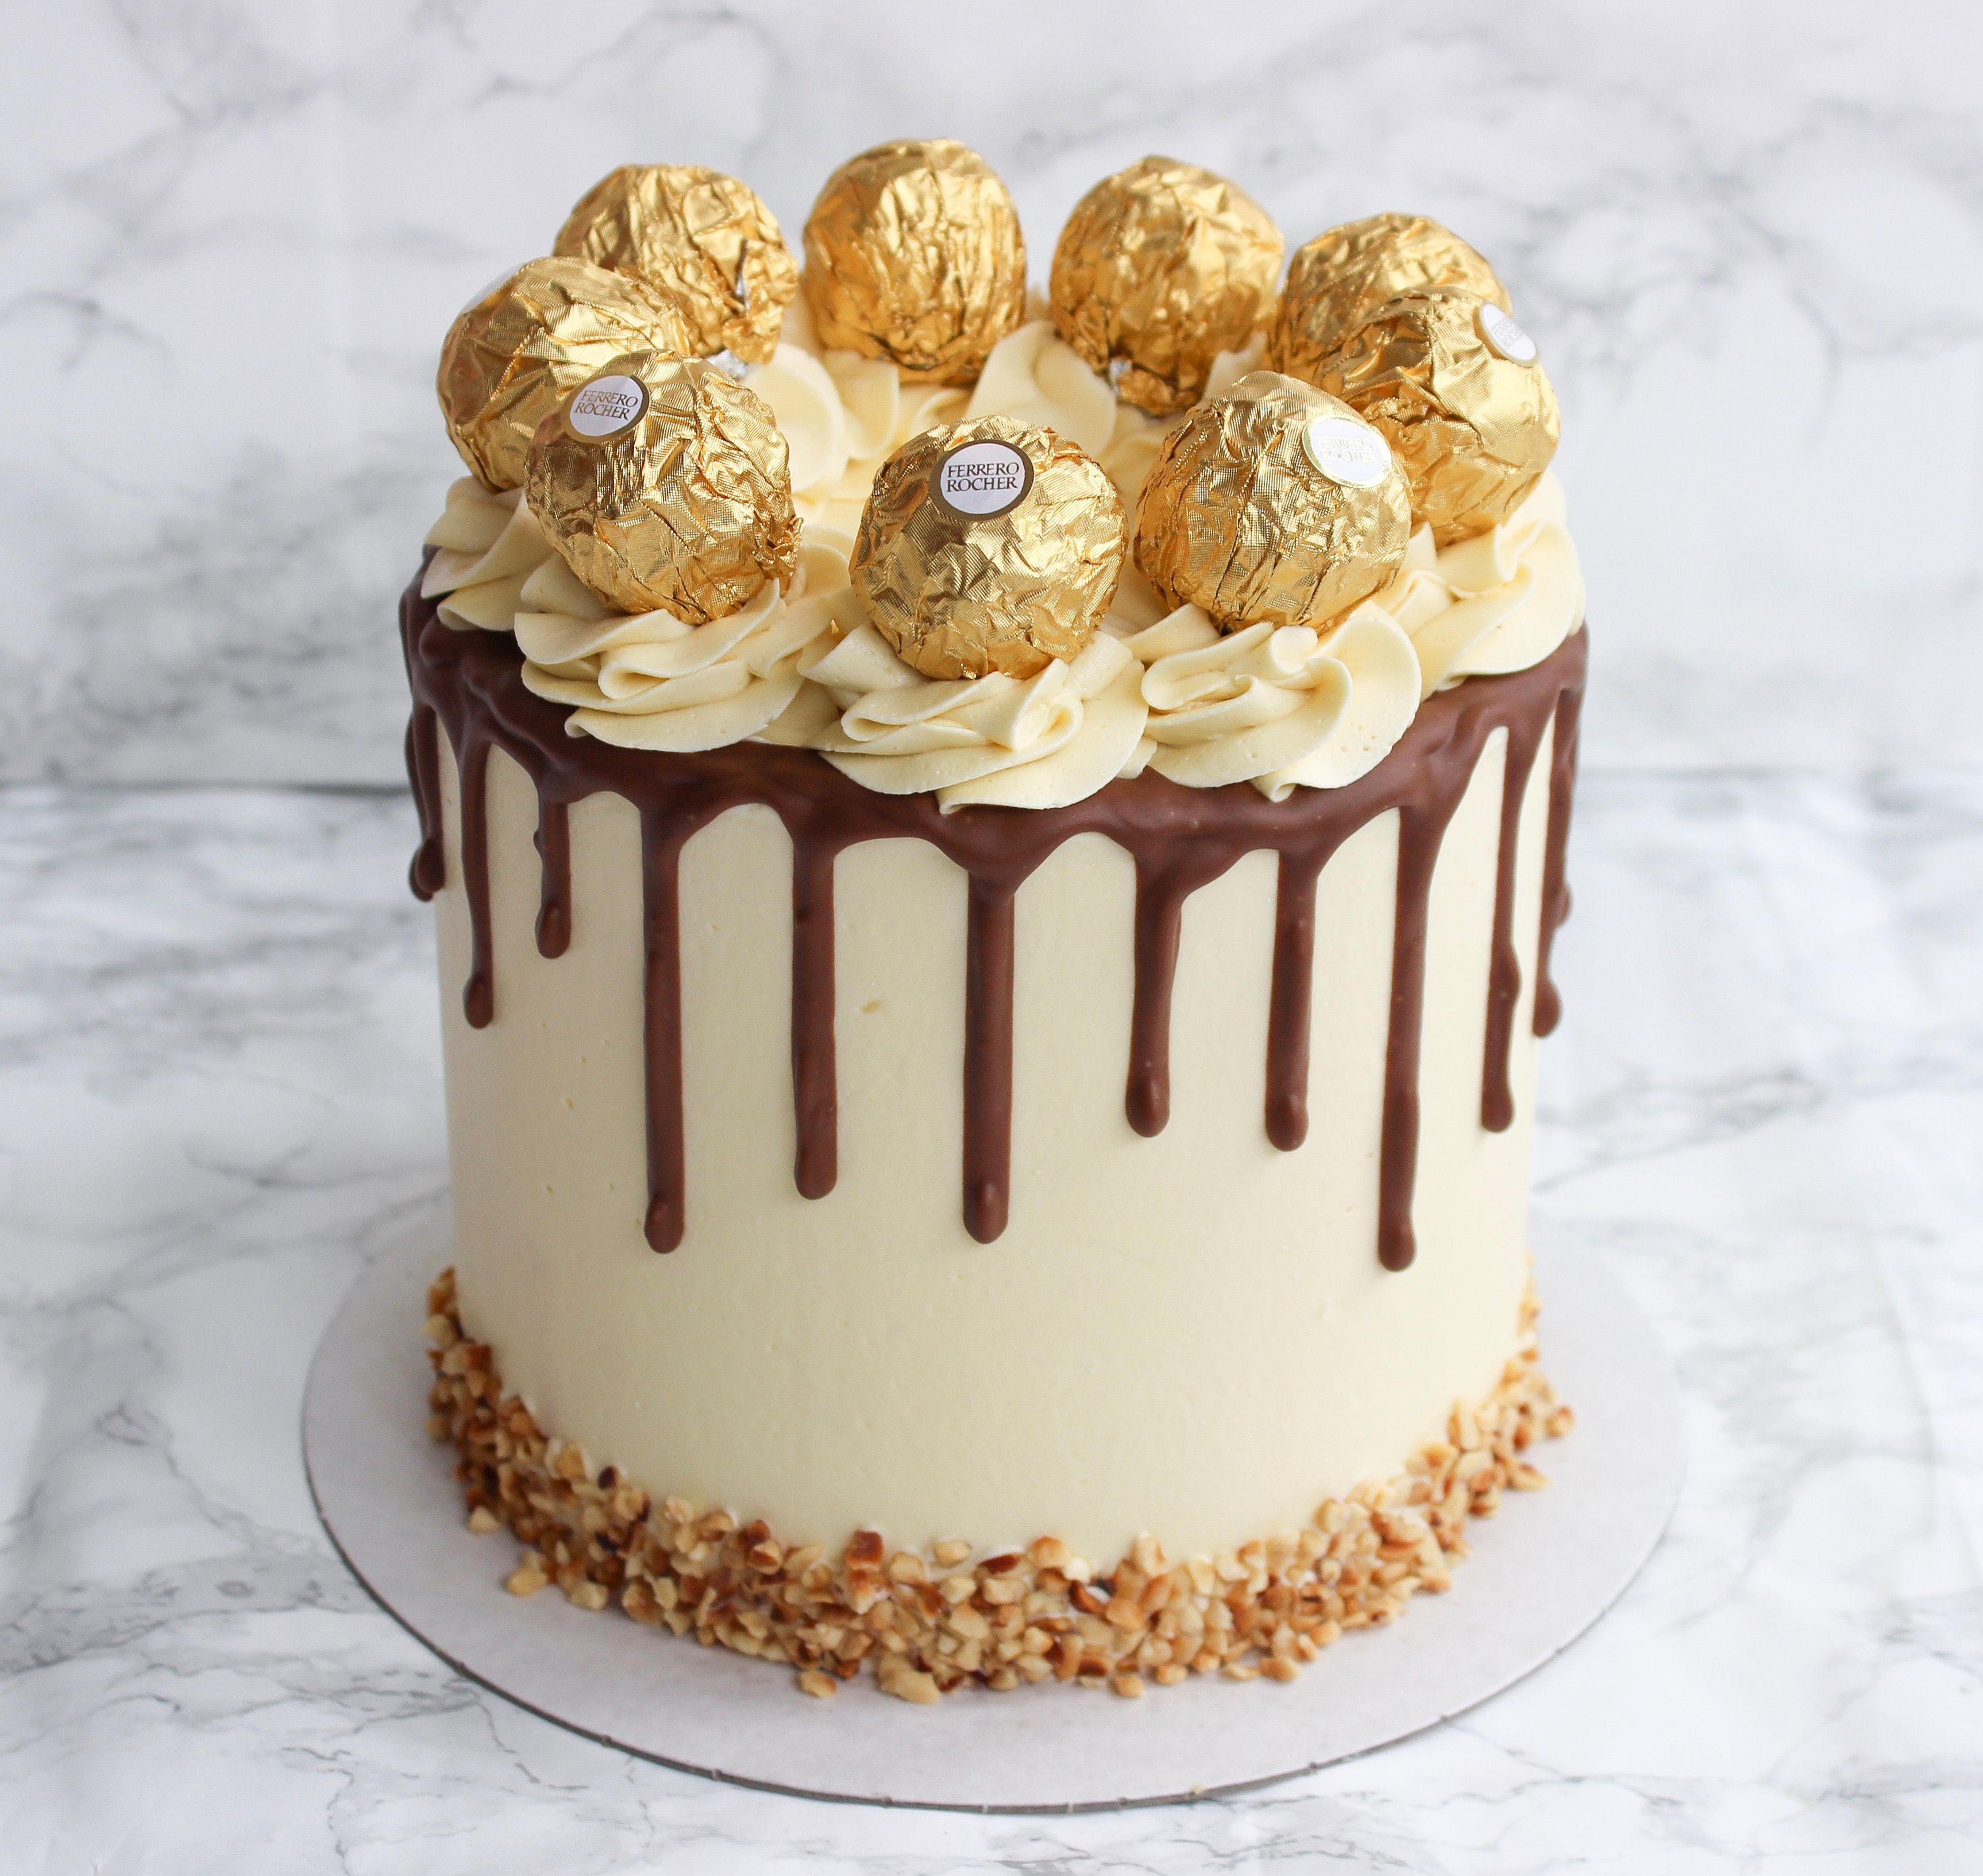 900 Ideas De Tortas En 2021 Tortas Pastel De Tortilla Torta De Cupcakes